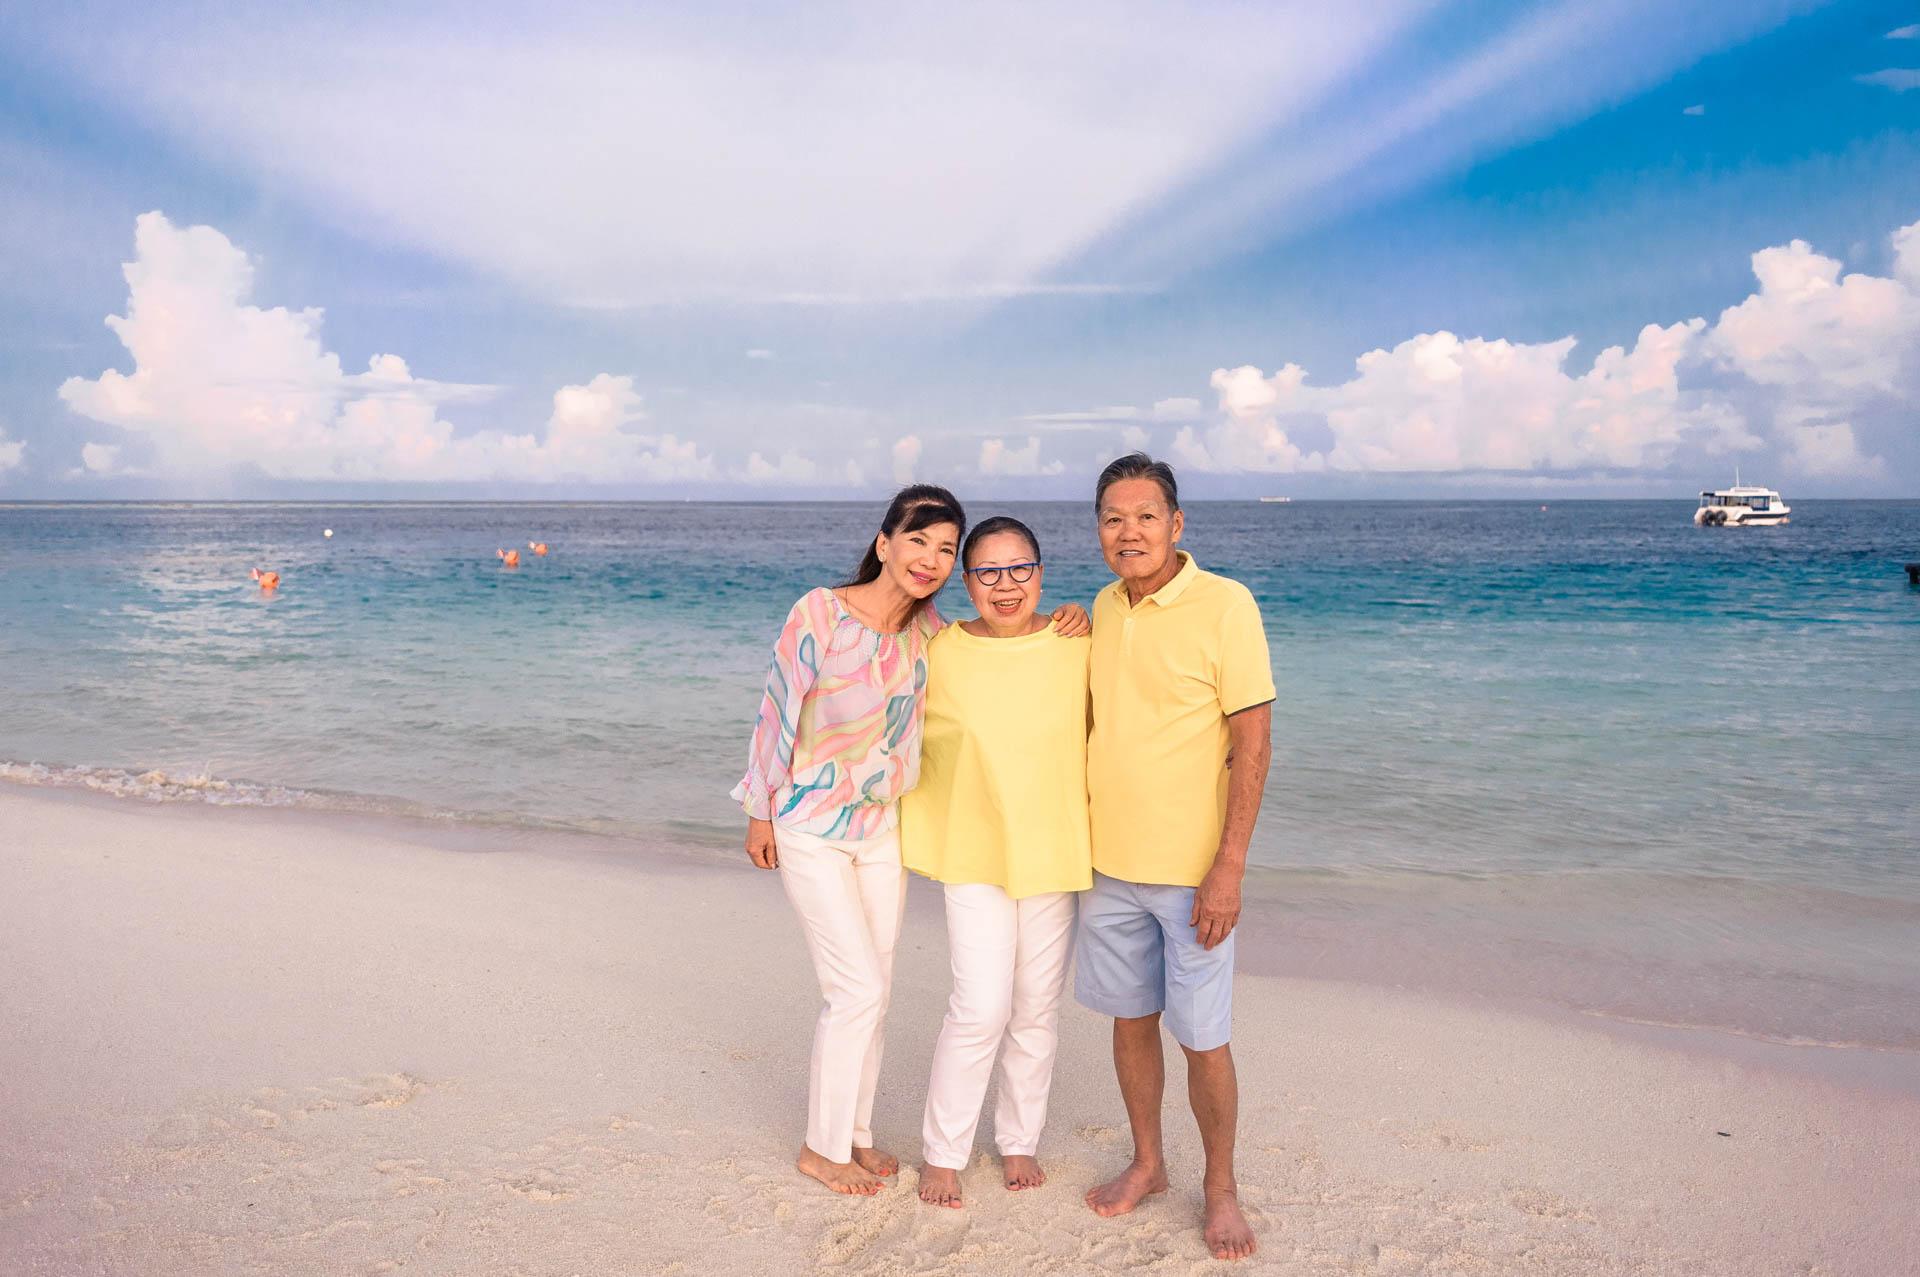 Jos Extended Family at Constance Moofushi Maldives 4